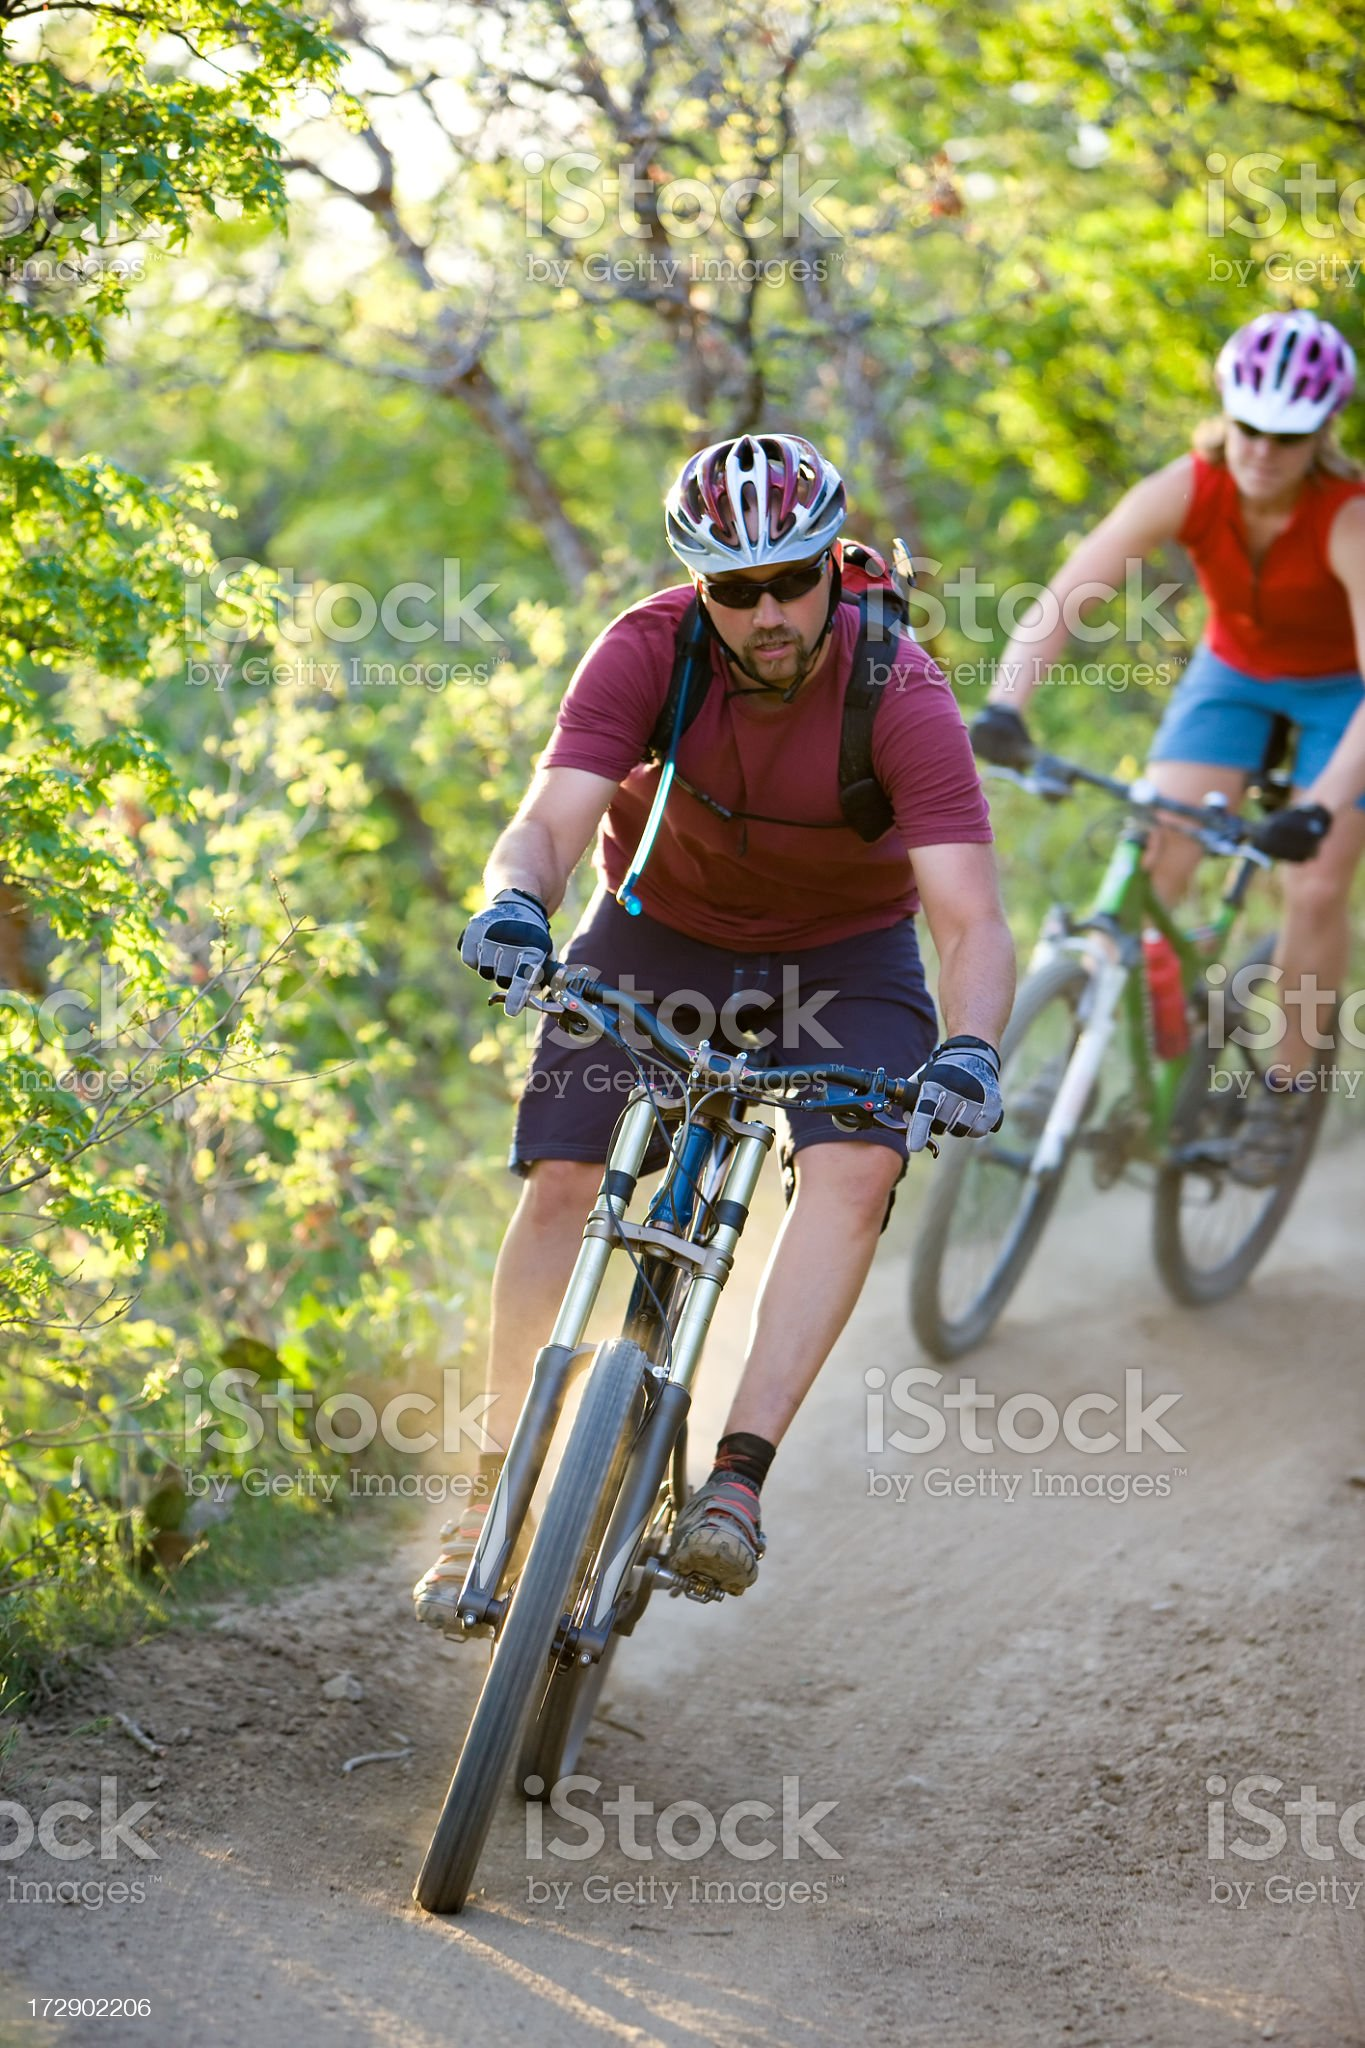 Couple Mountain Biking at Dusk royalty-free stock photo